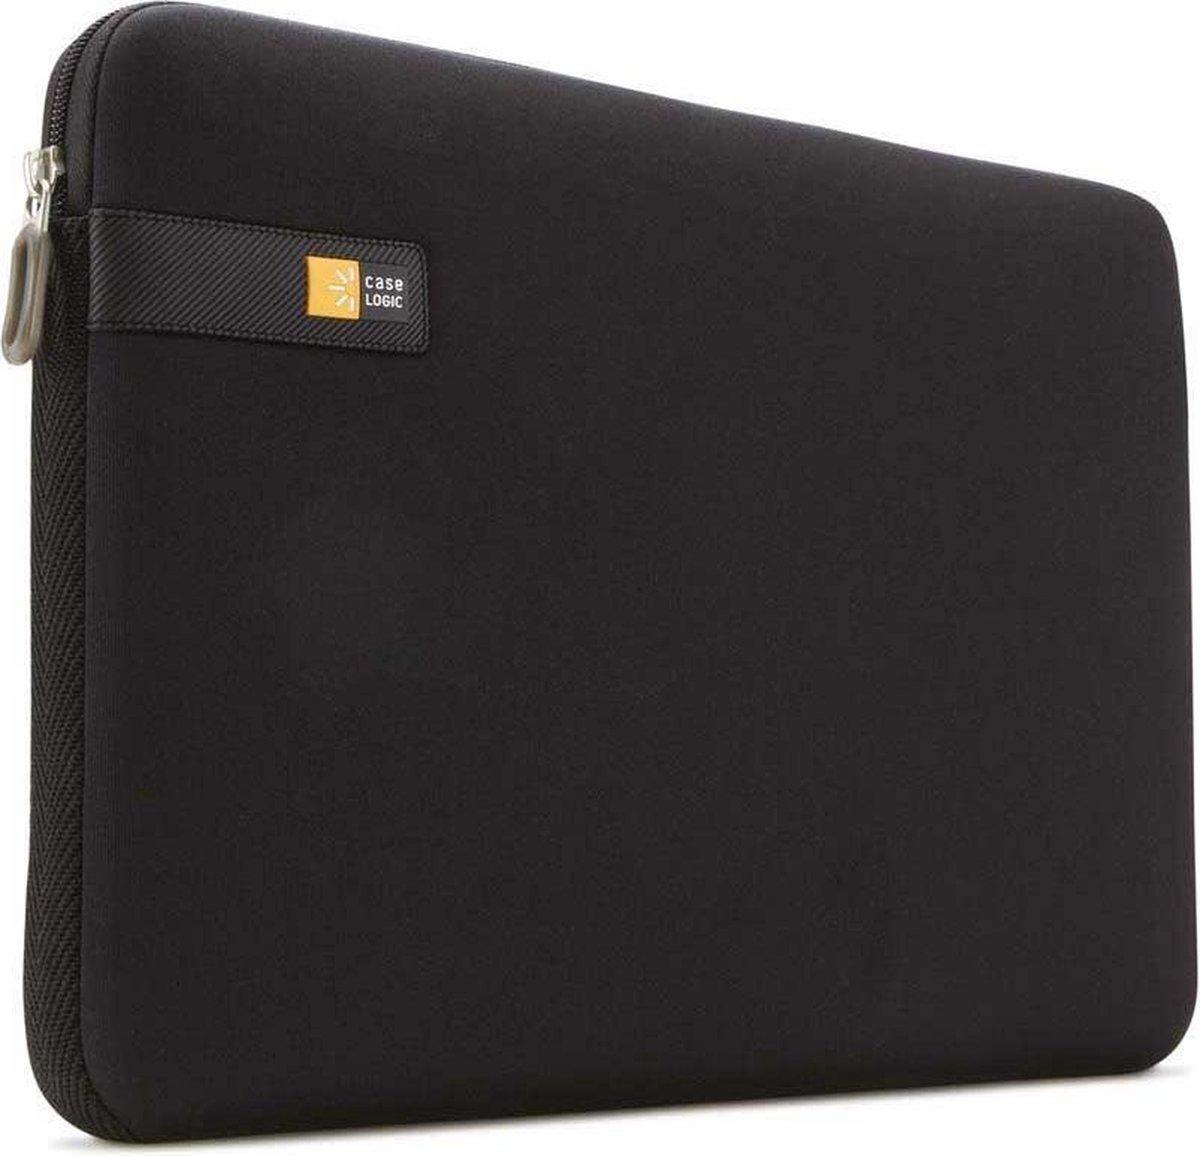 Case Logic LAPS114 - Laptophoes 14 inch - Zwart